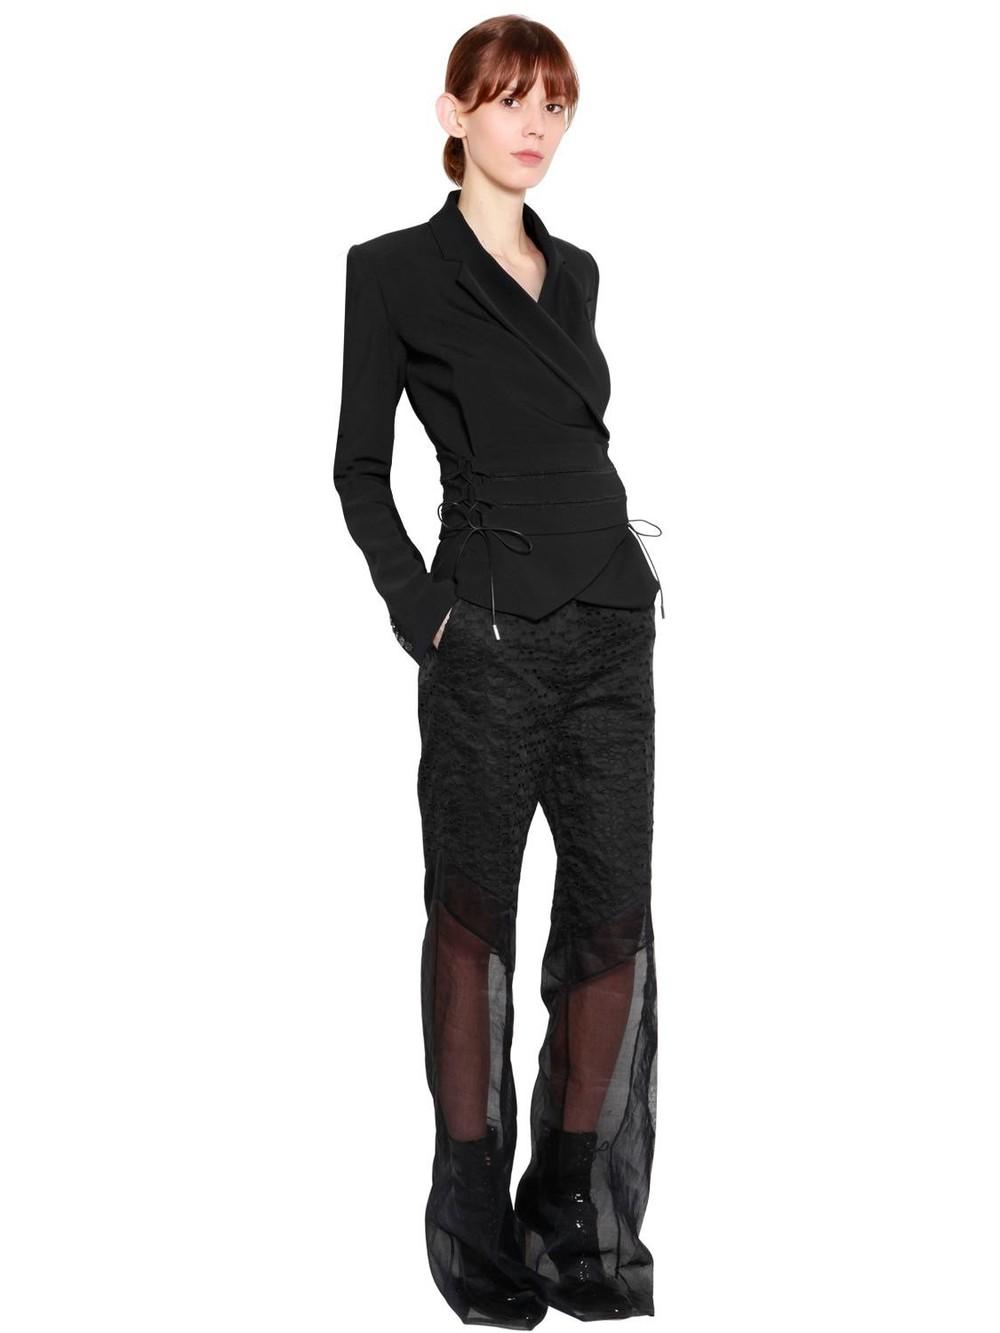 ANTONIO BERARDI Wrap Cady Jacket With Ties in black